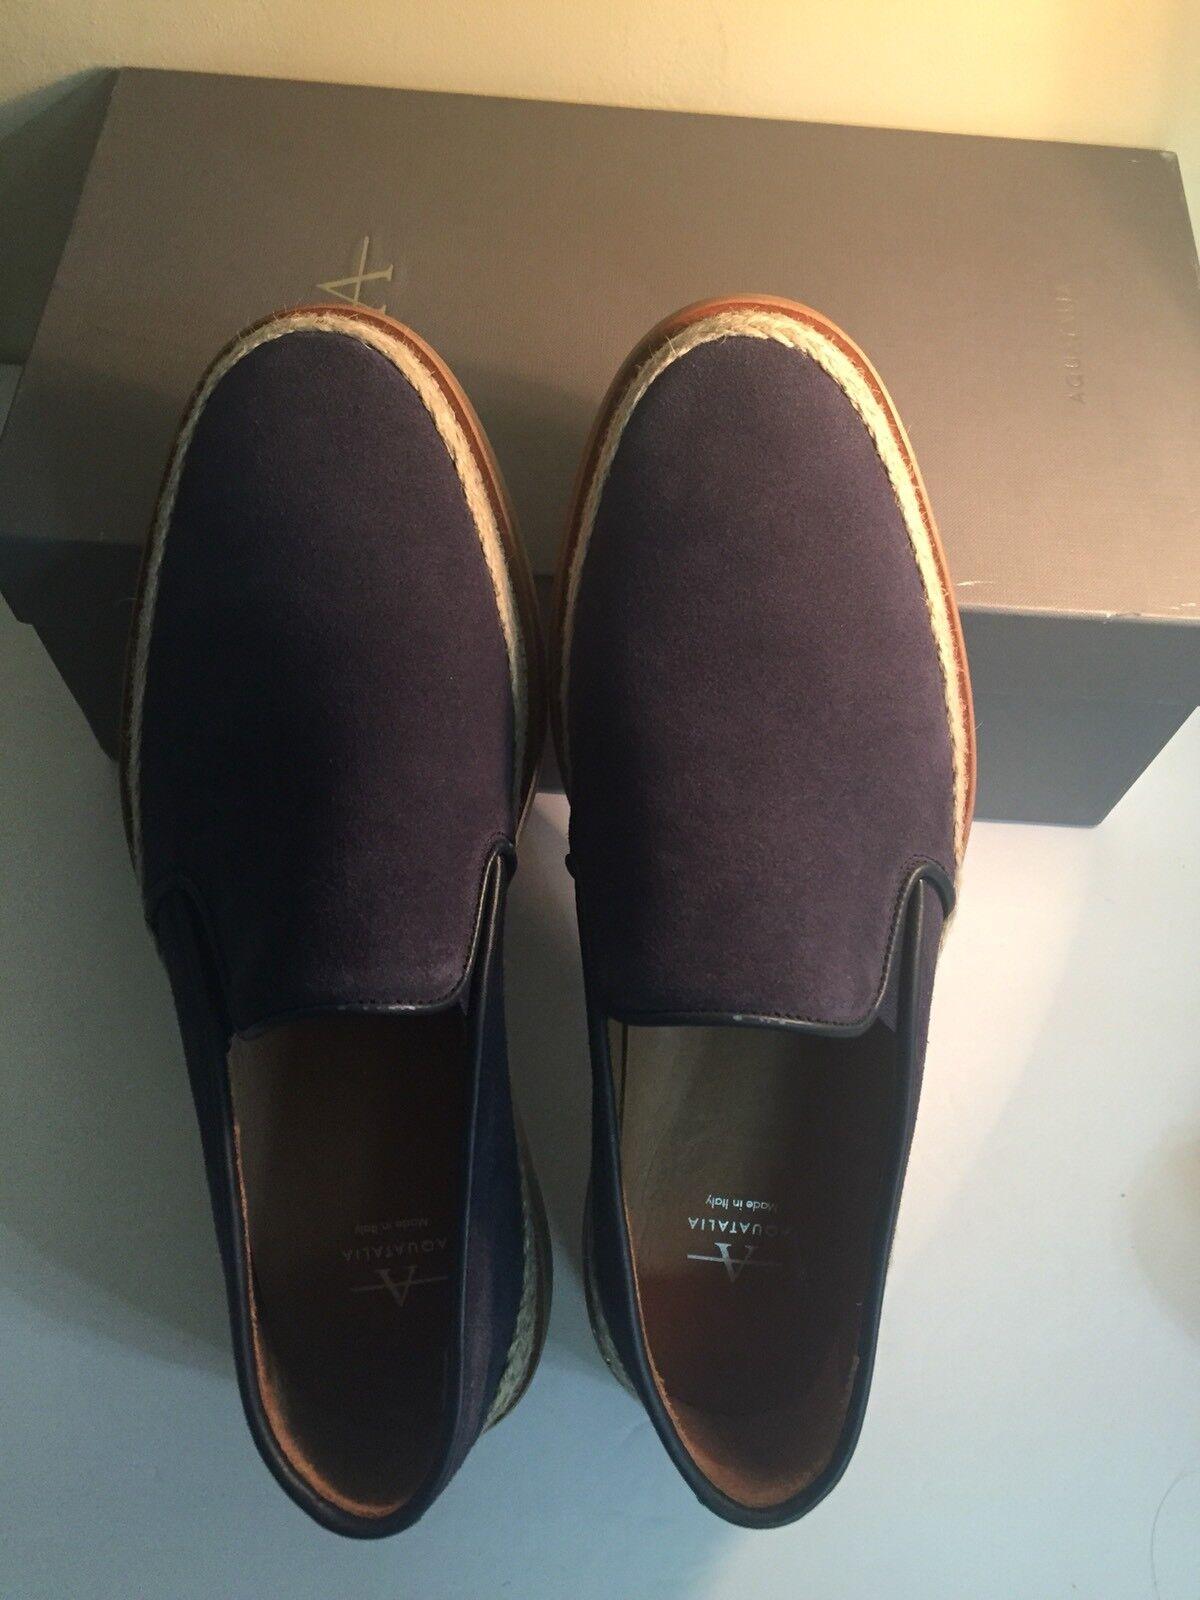 Mens Aquatalia Zayn Navy Blue Suede Loafers Size 9 M 395